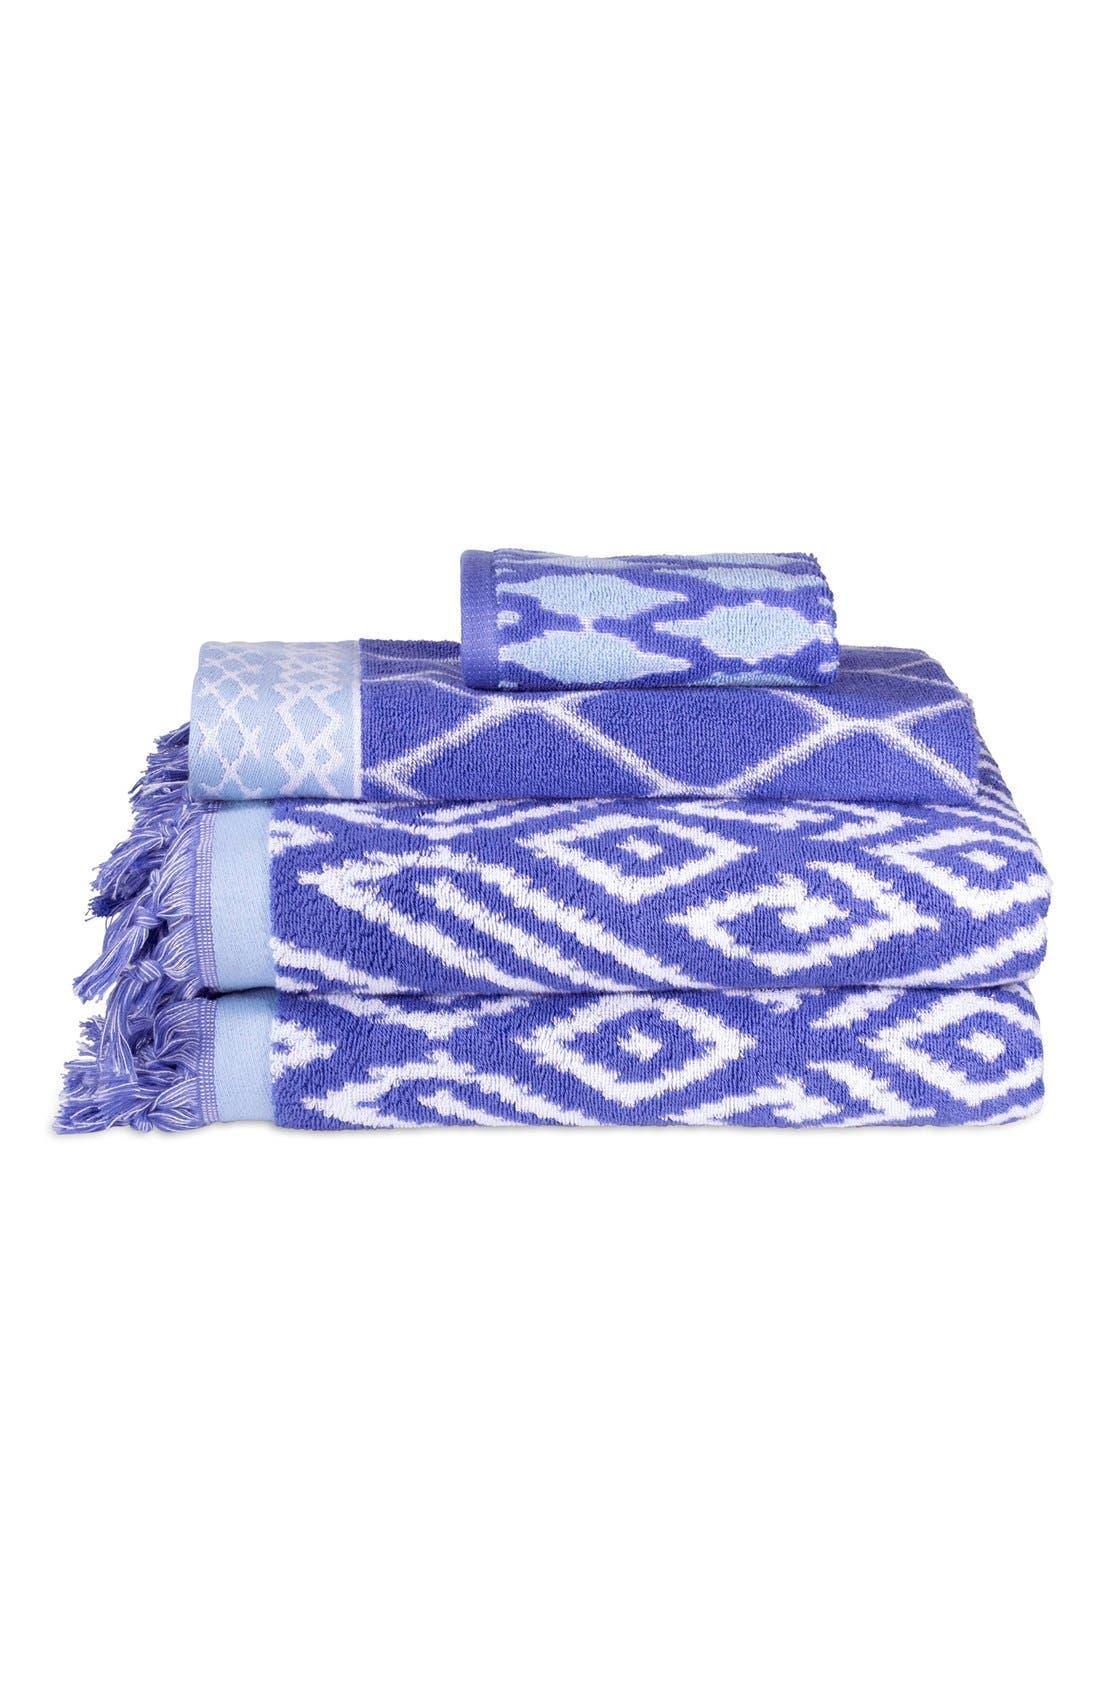 'Kalasin' Turkish Cotton Bath Towel,                         Main,                         color, Periwinkle